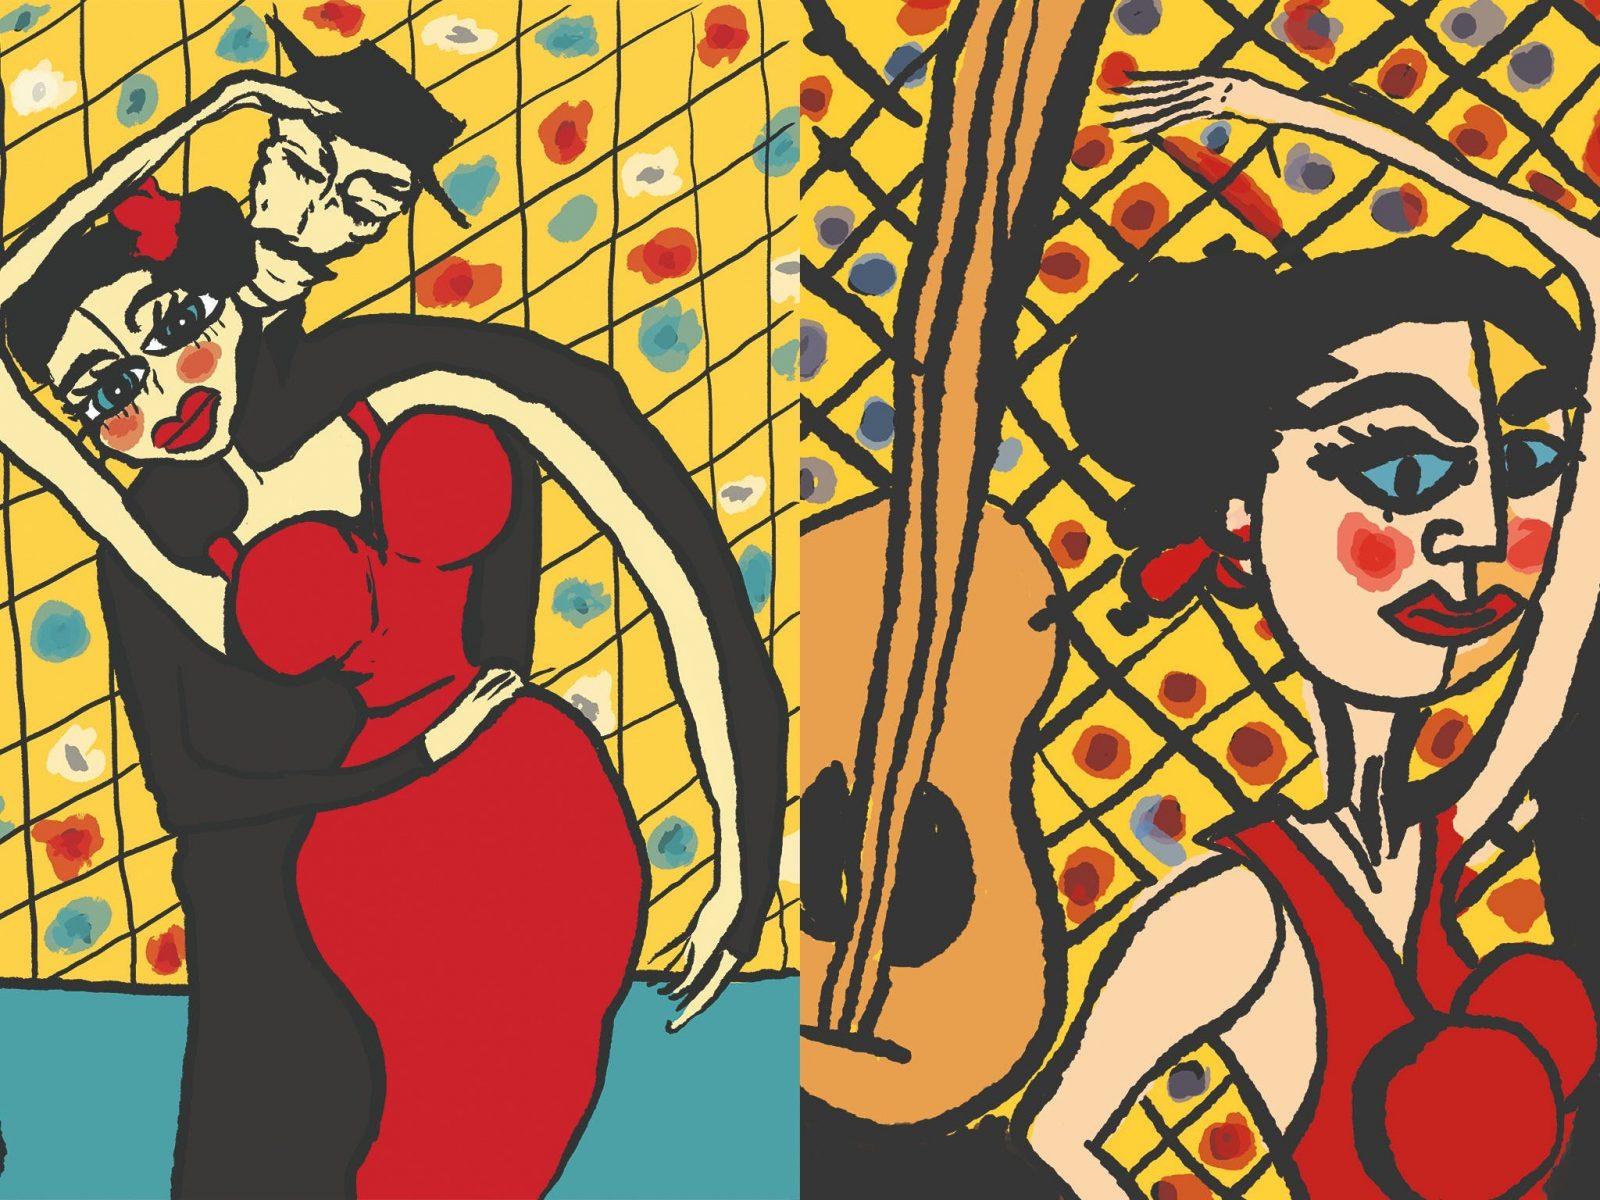 España El Vito the Spirit of Spain and Tango